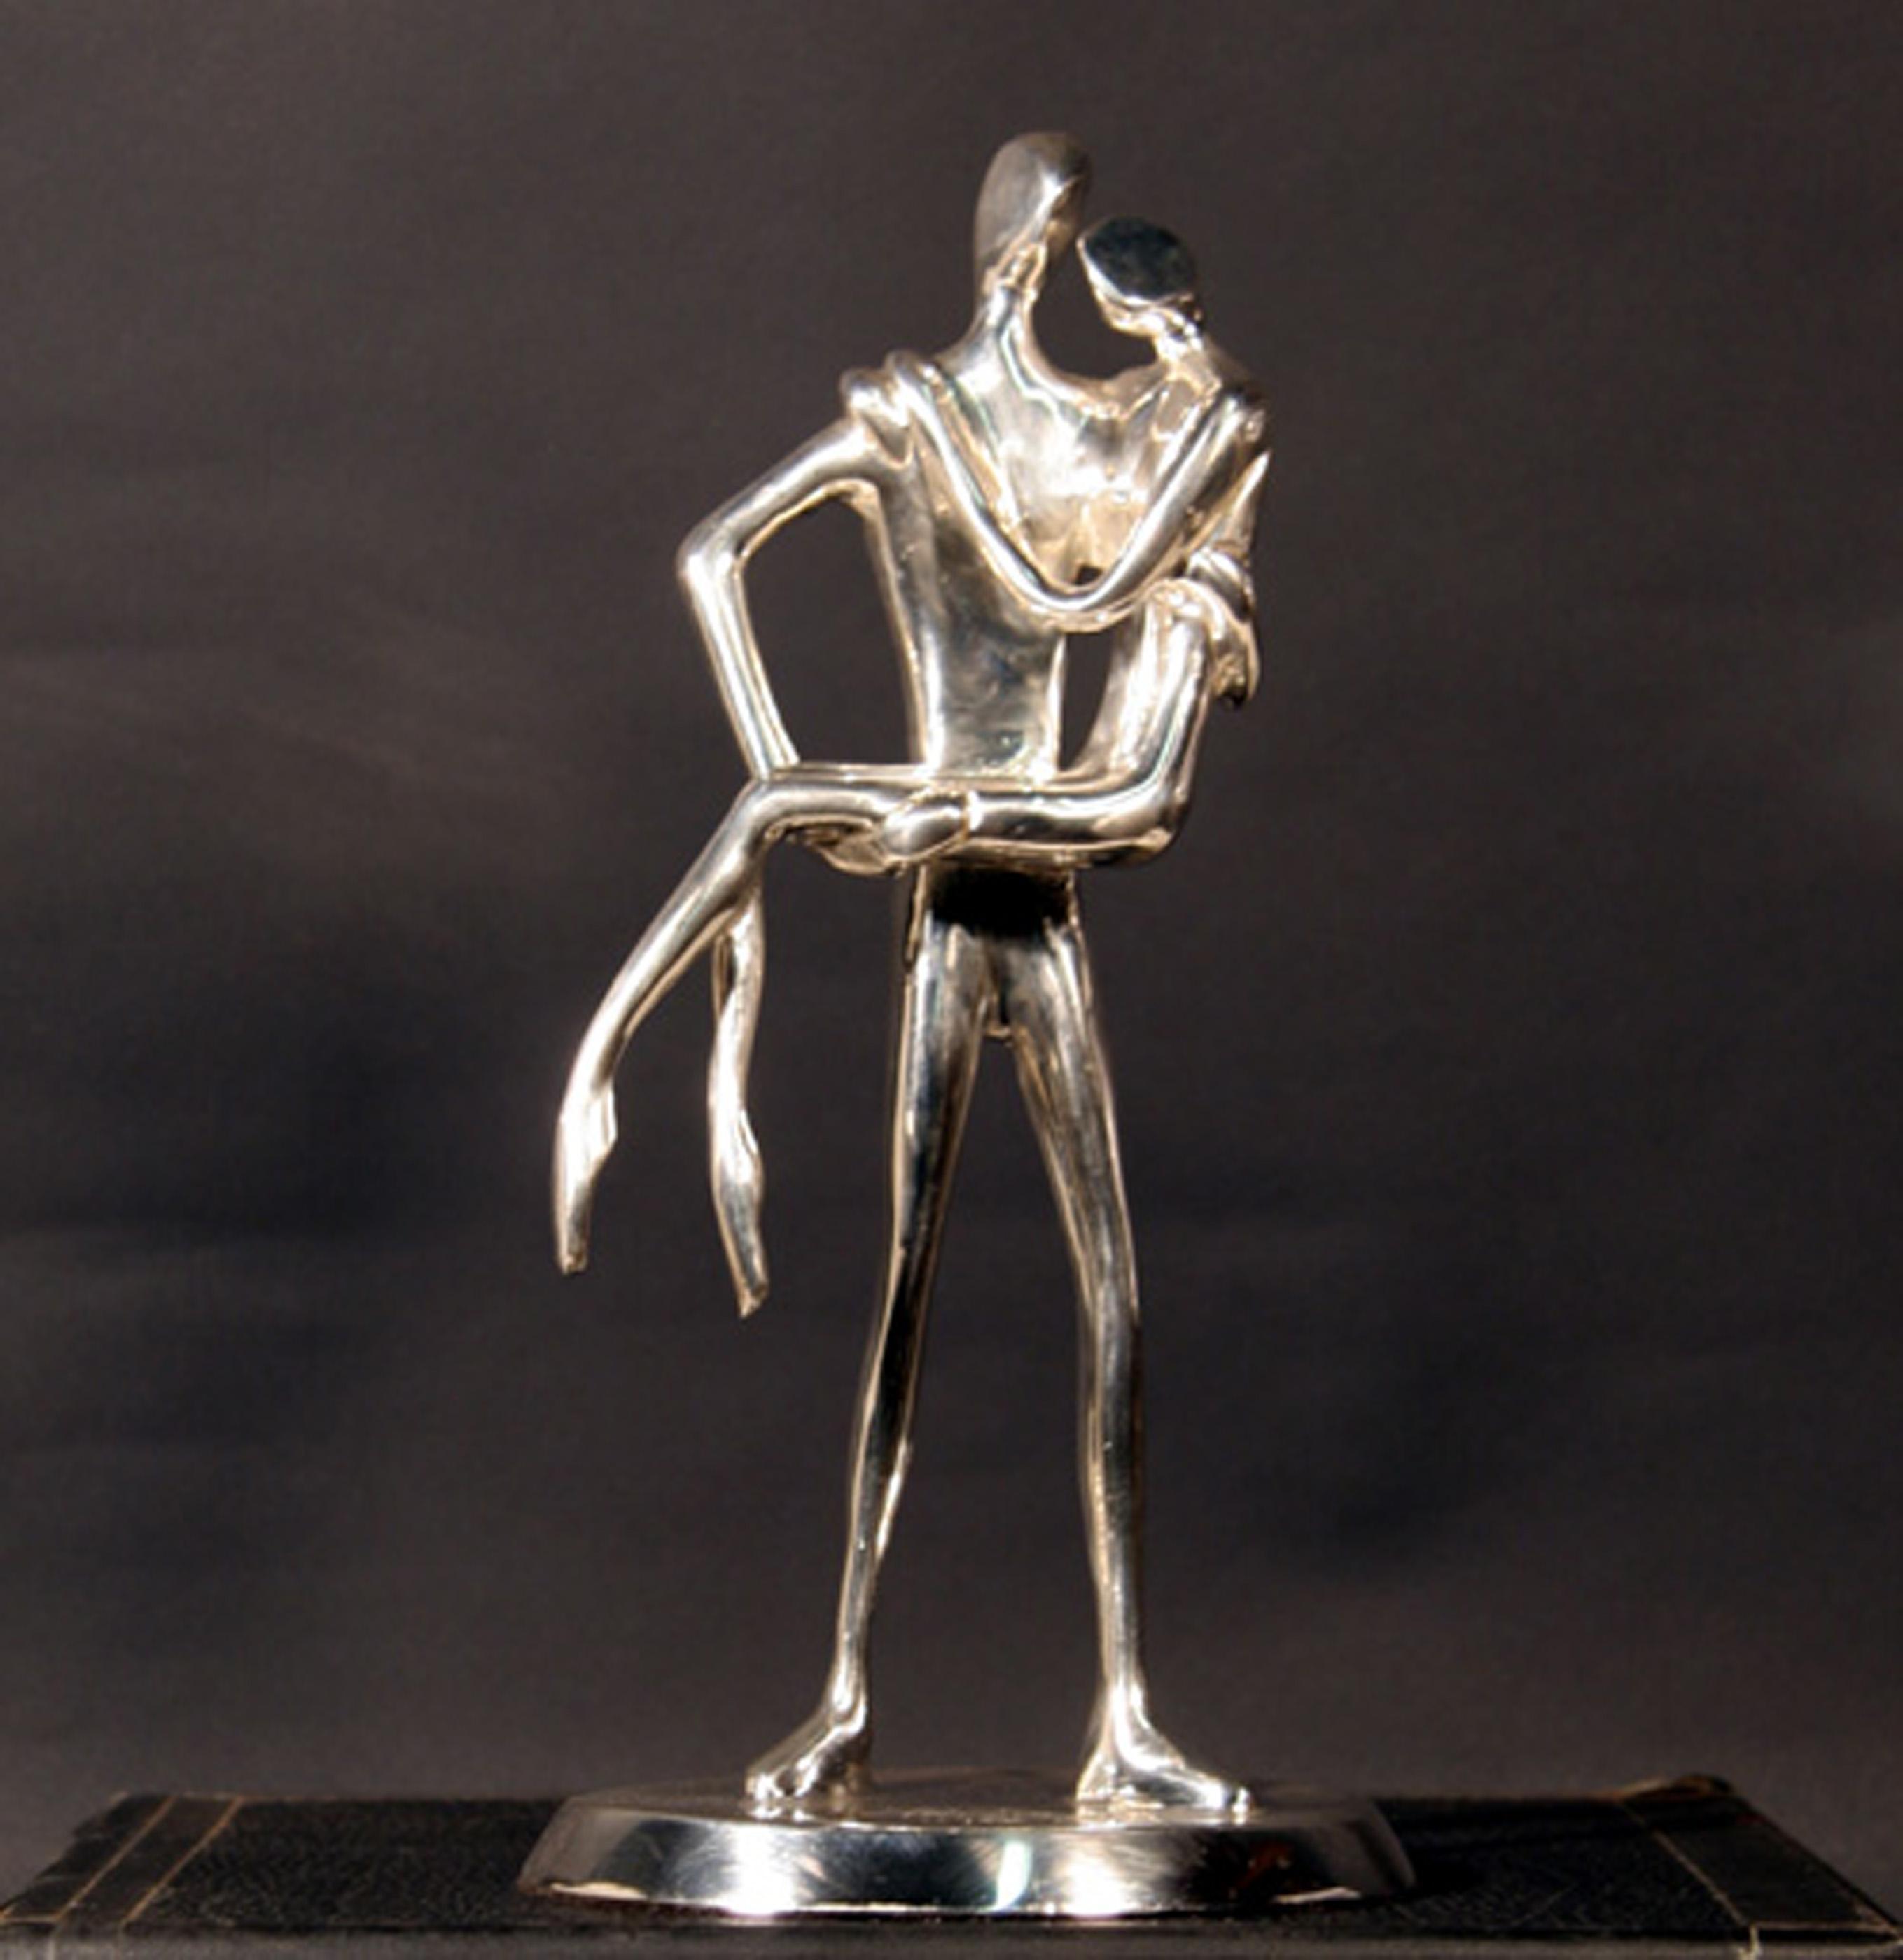 Jose Almanzor, Noche de Bodas (Silver), Bronze Sculpture with silver plating